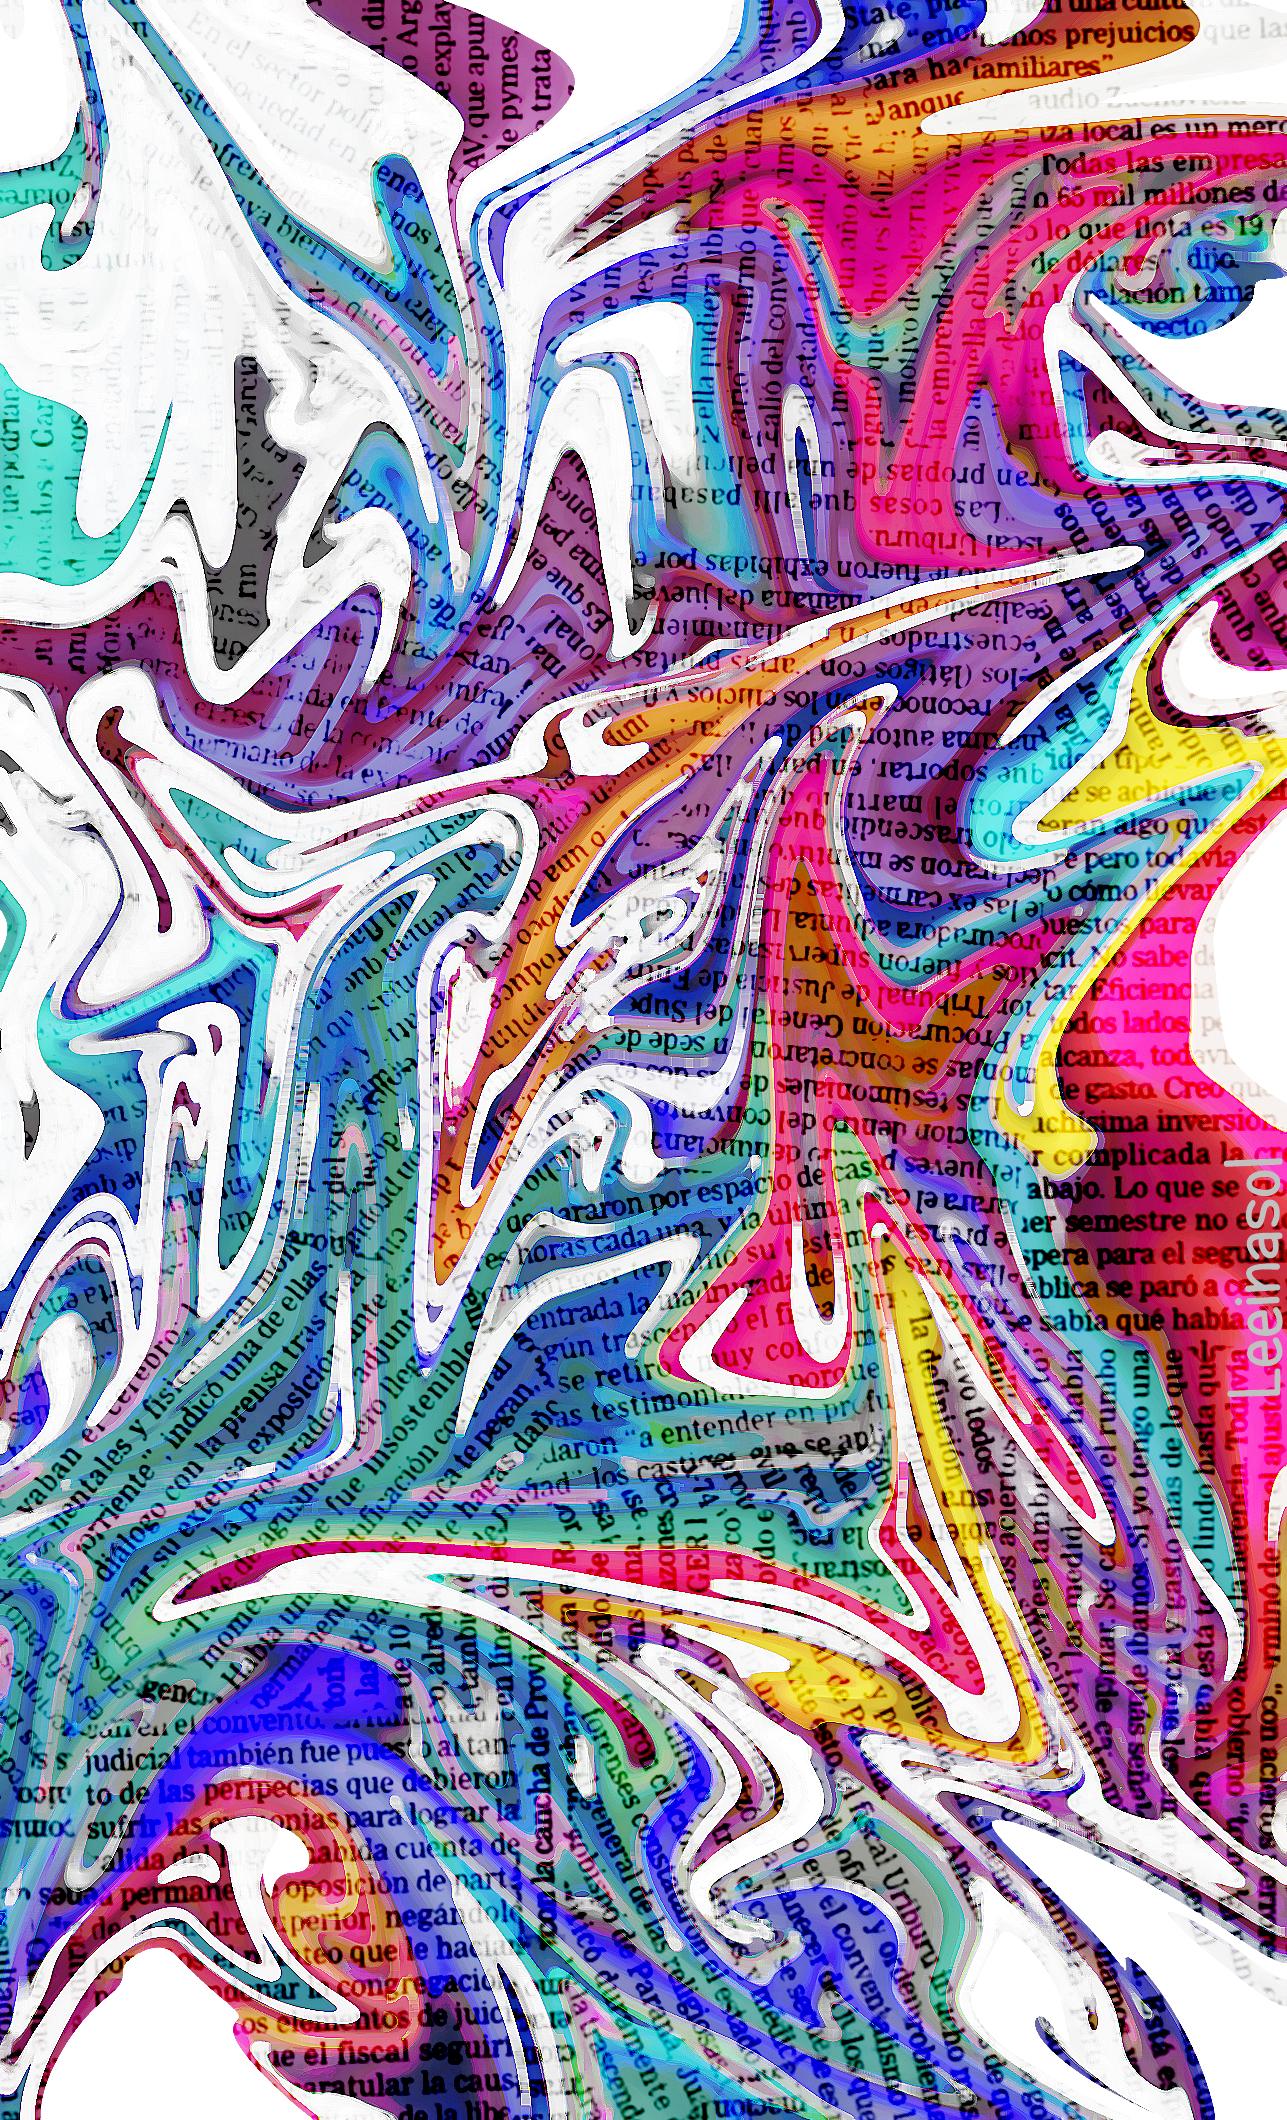 wallpaper, background, color, diario, newspaper, manchas